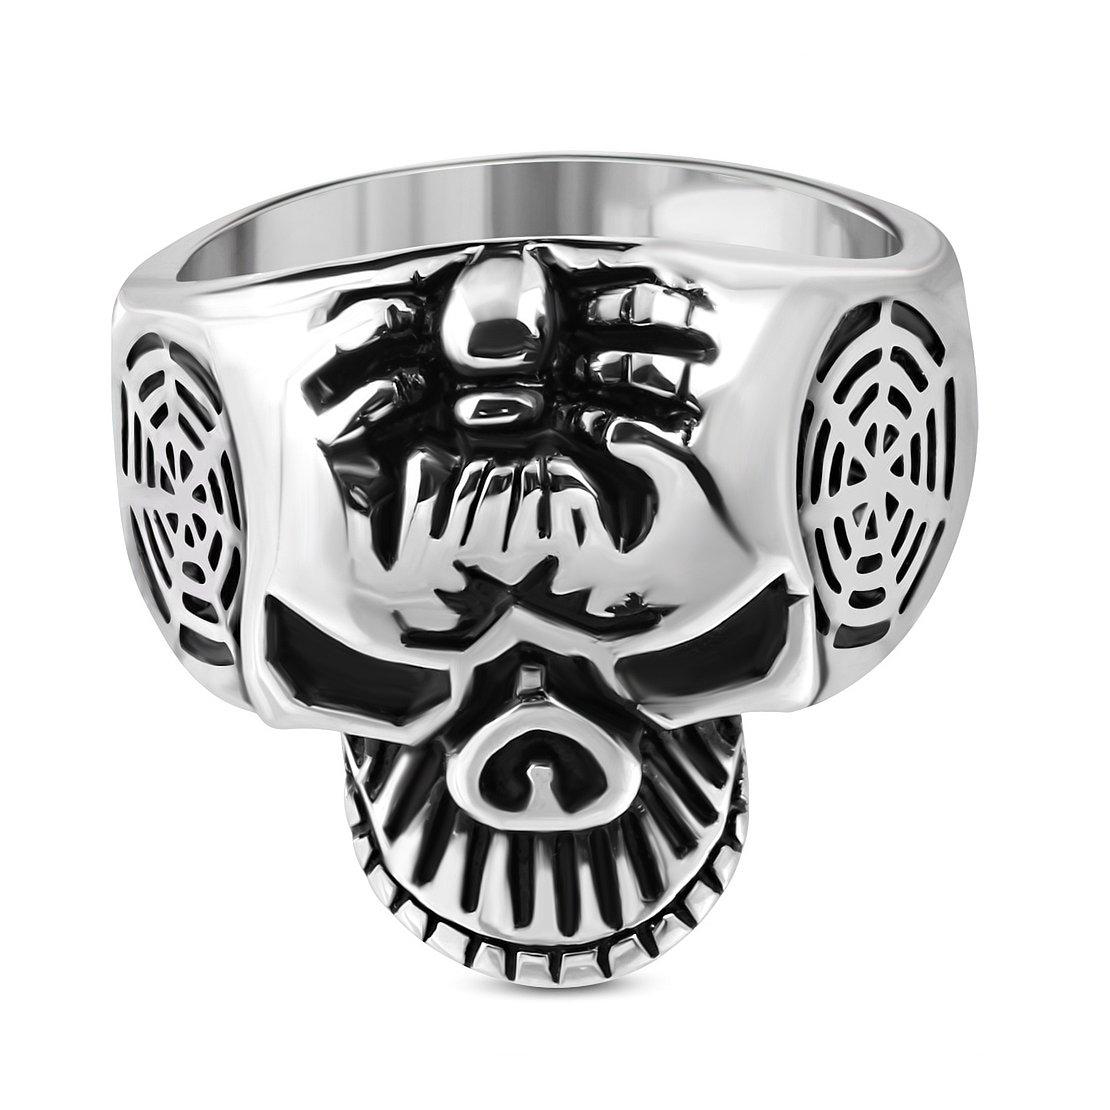 Stainless Steel 2 Color Cluster Ghost Skull Biker Ring